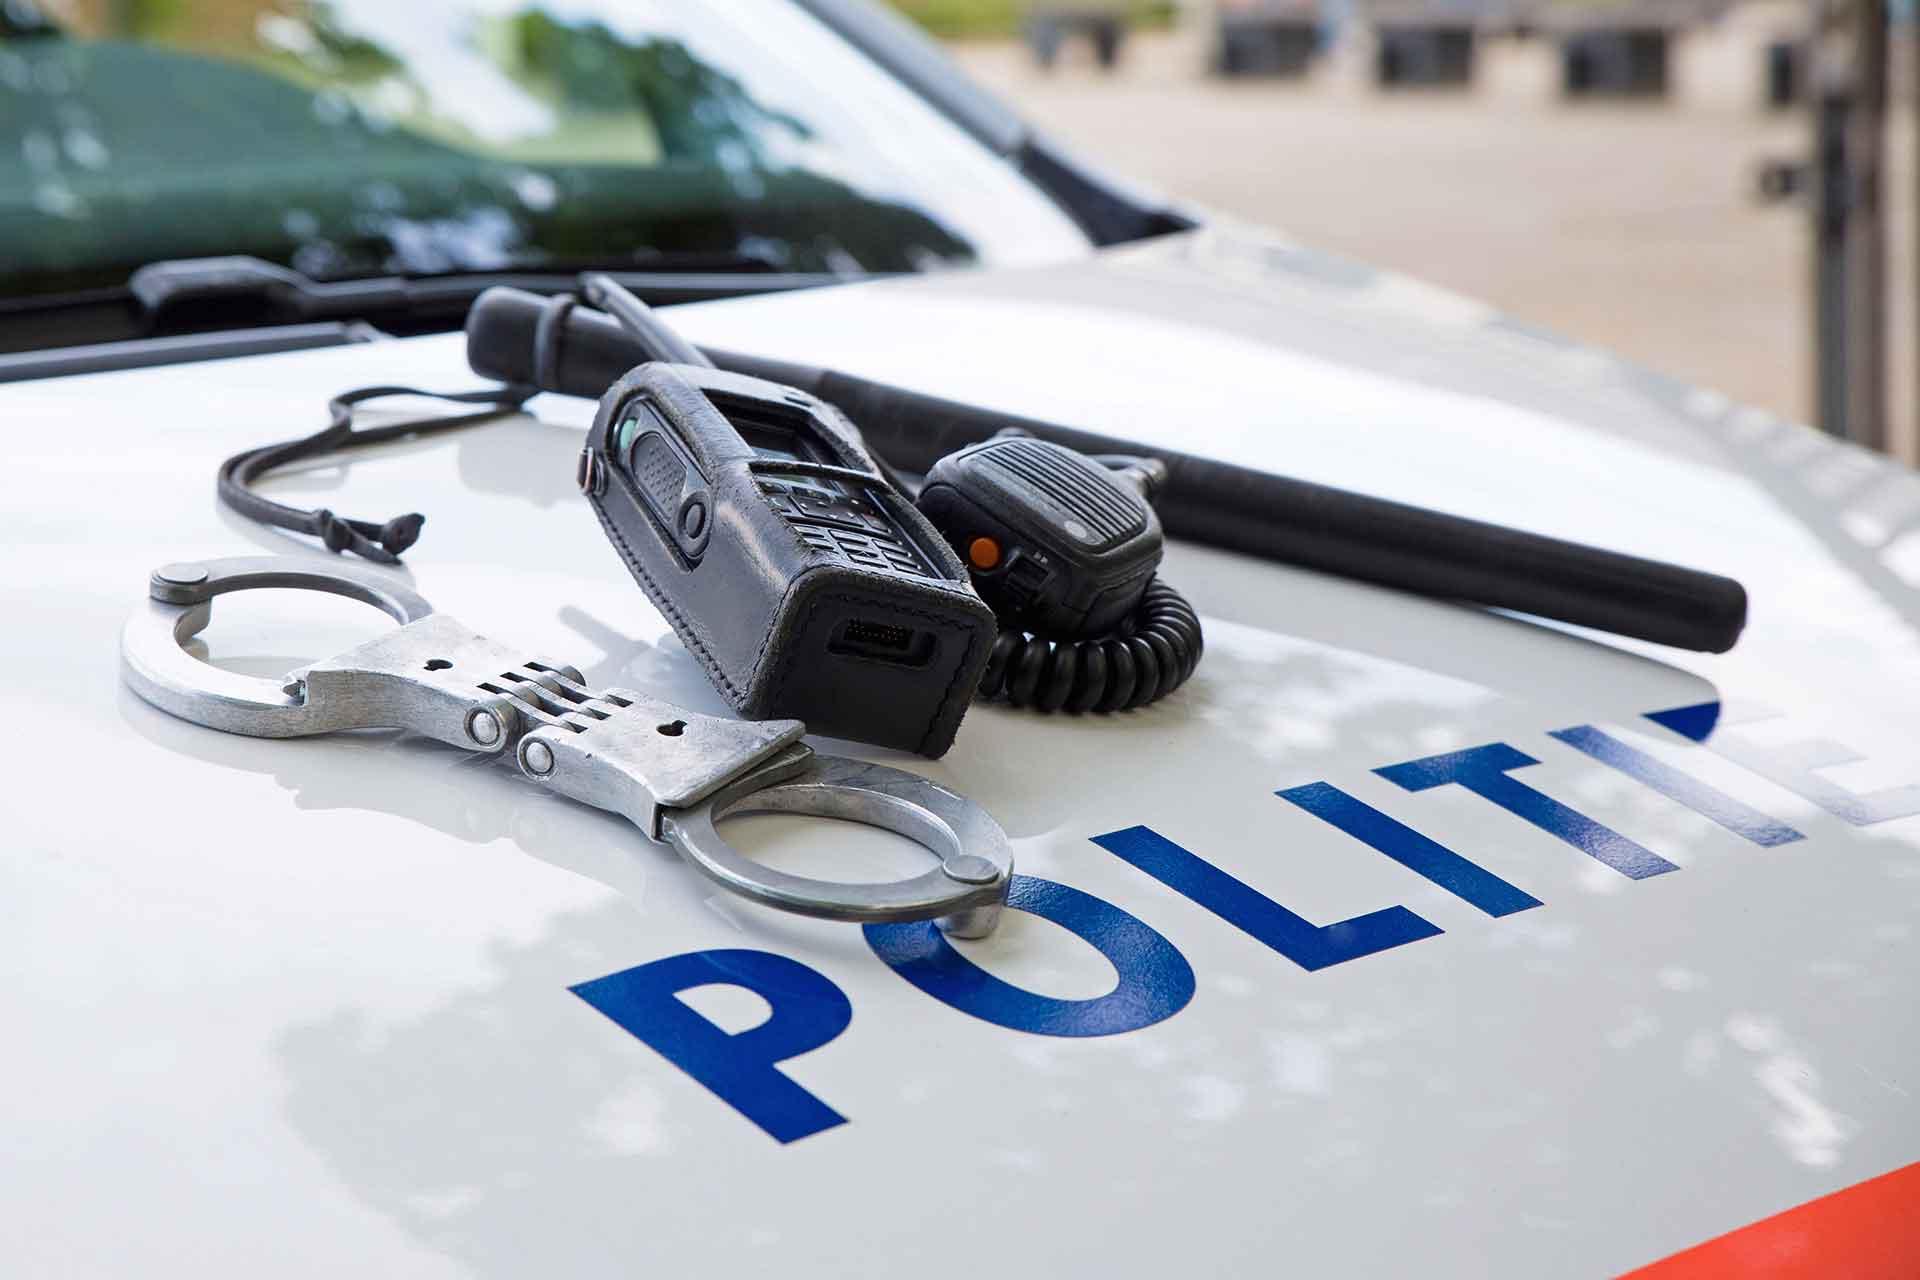 Spraakmakende strafzaken - Moord Bossche Huukske